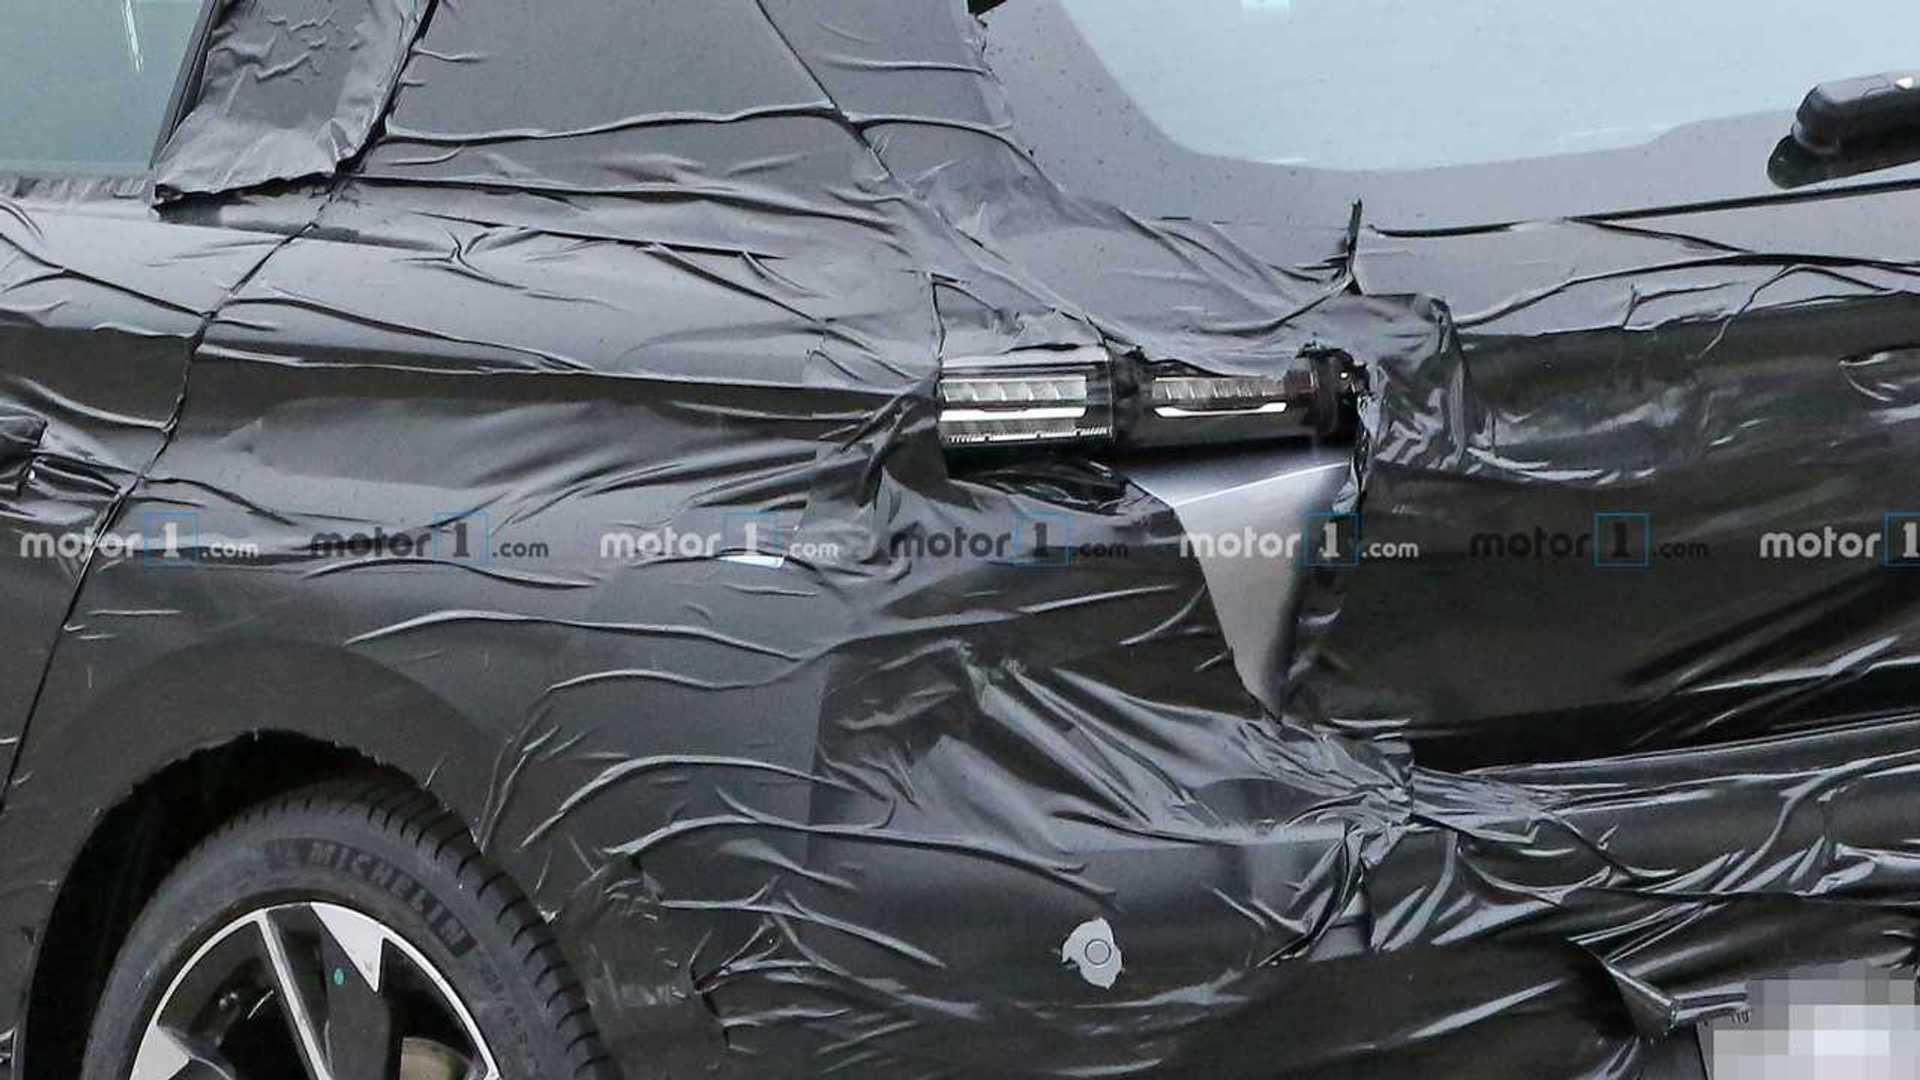 2021 - [Peugeot] 308 III [P51/P52] - Page 8 2021-peugeot-308-spy-photos